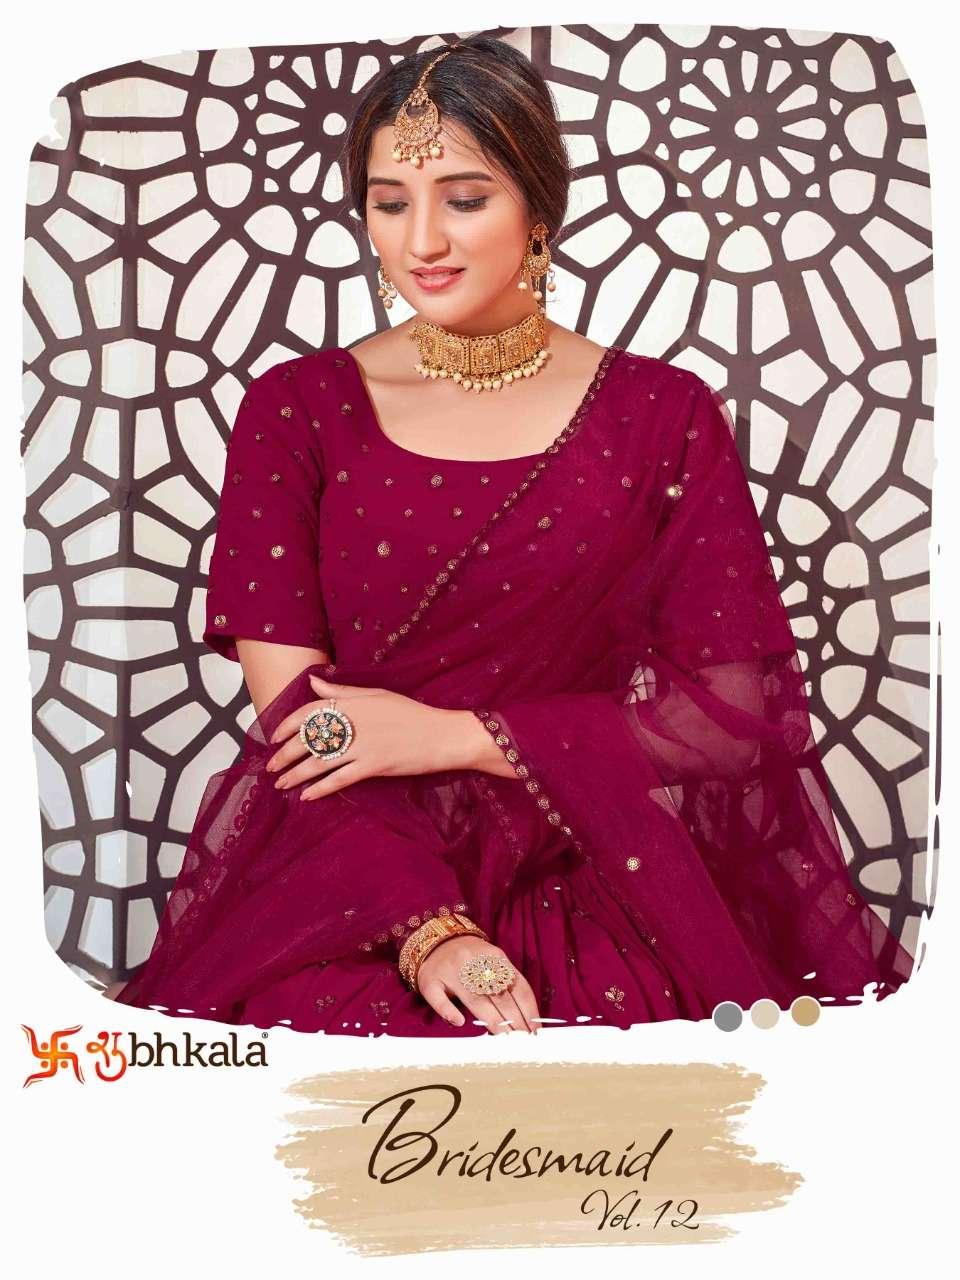 Shubhkala Bridesmaid Vol. 12 Exclusive Designer Bridal Lehenga Choli